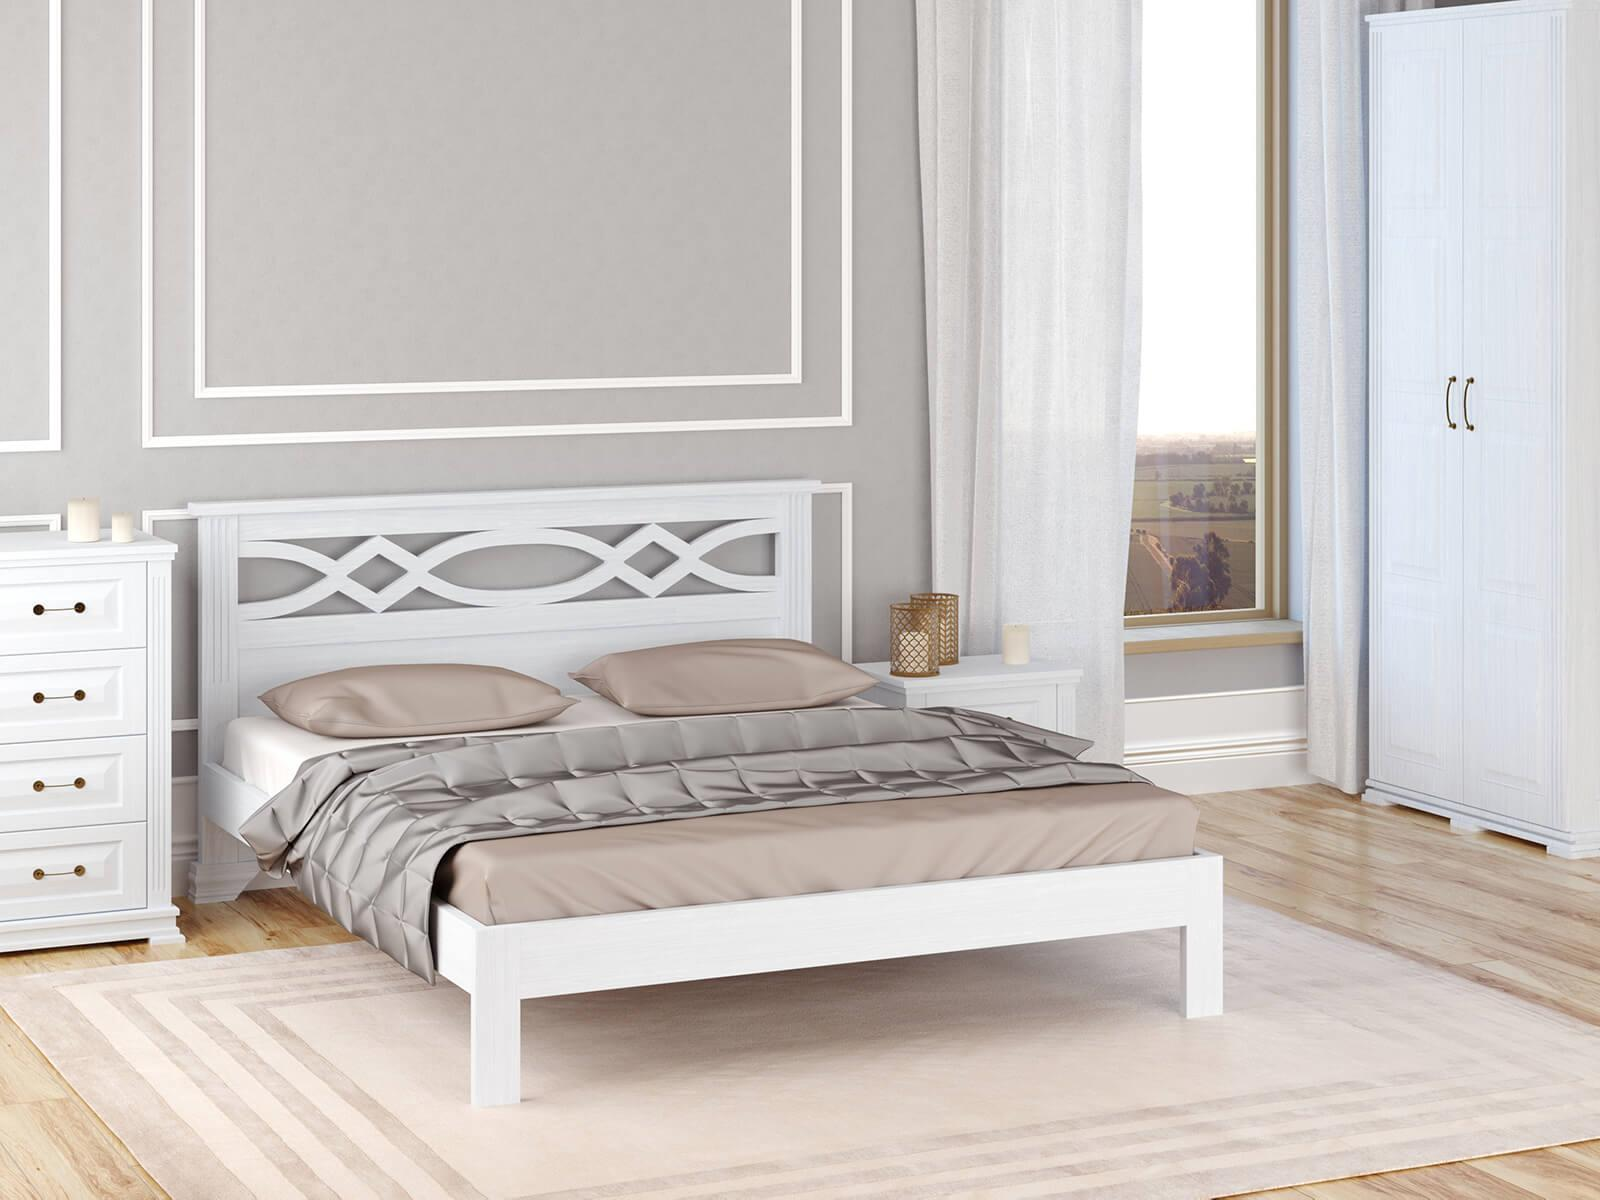 120cm seng